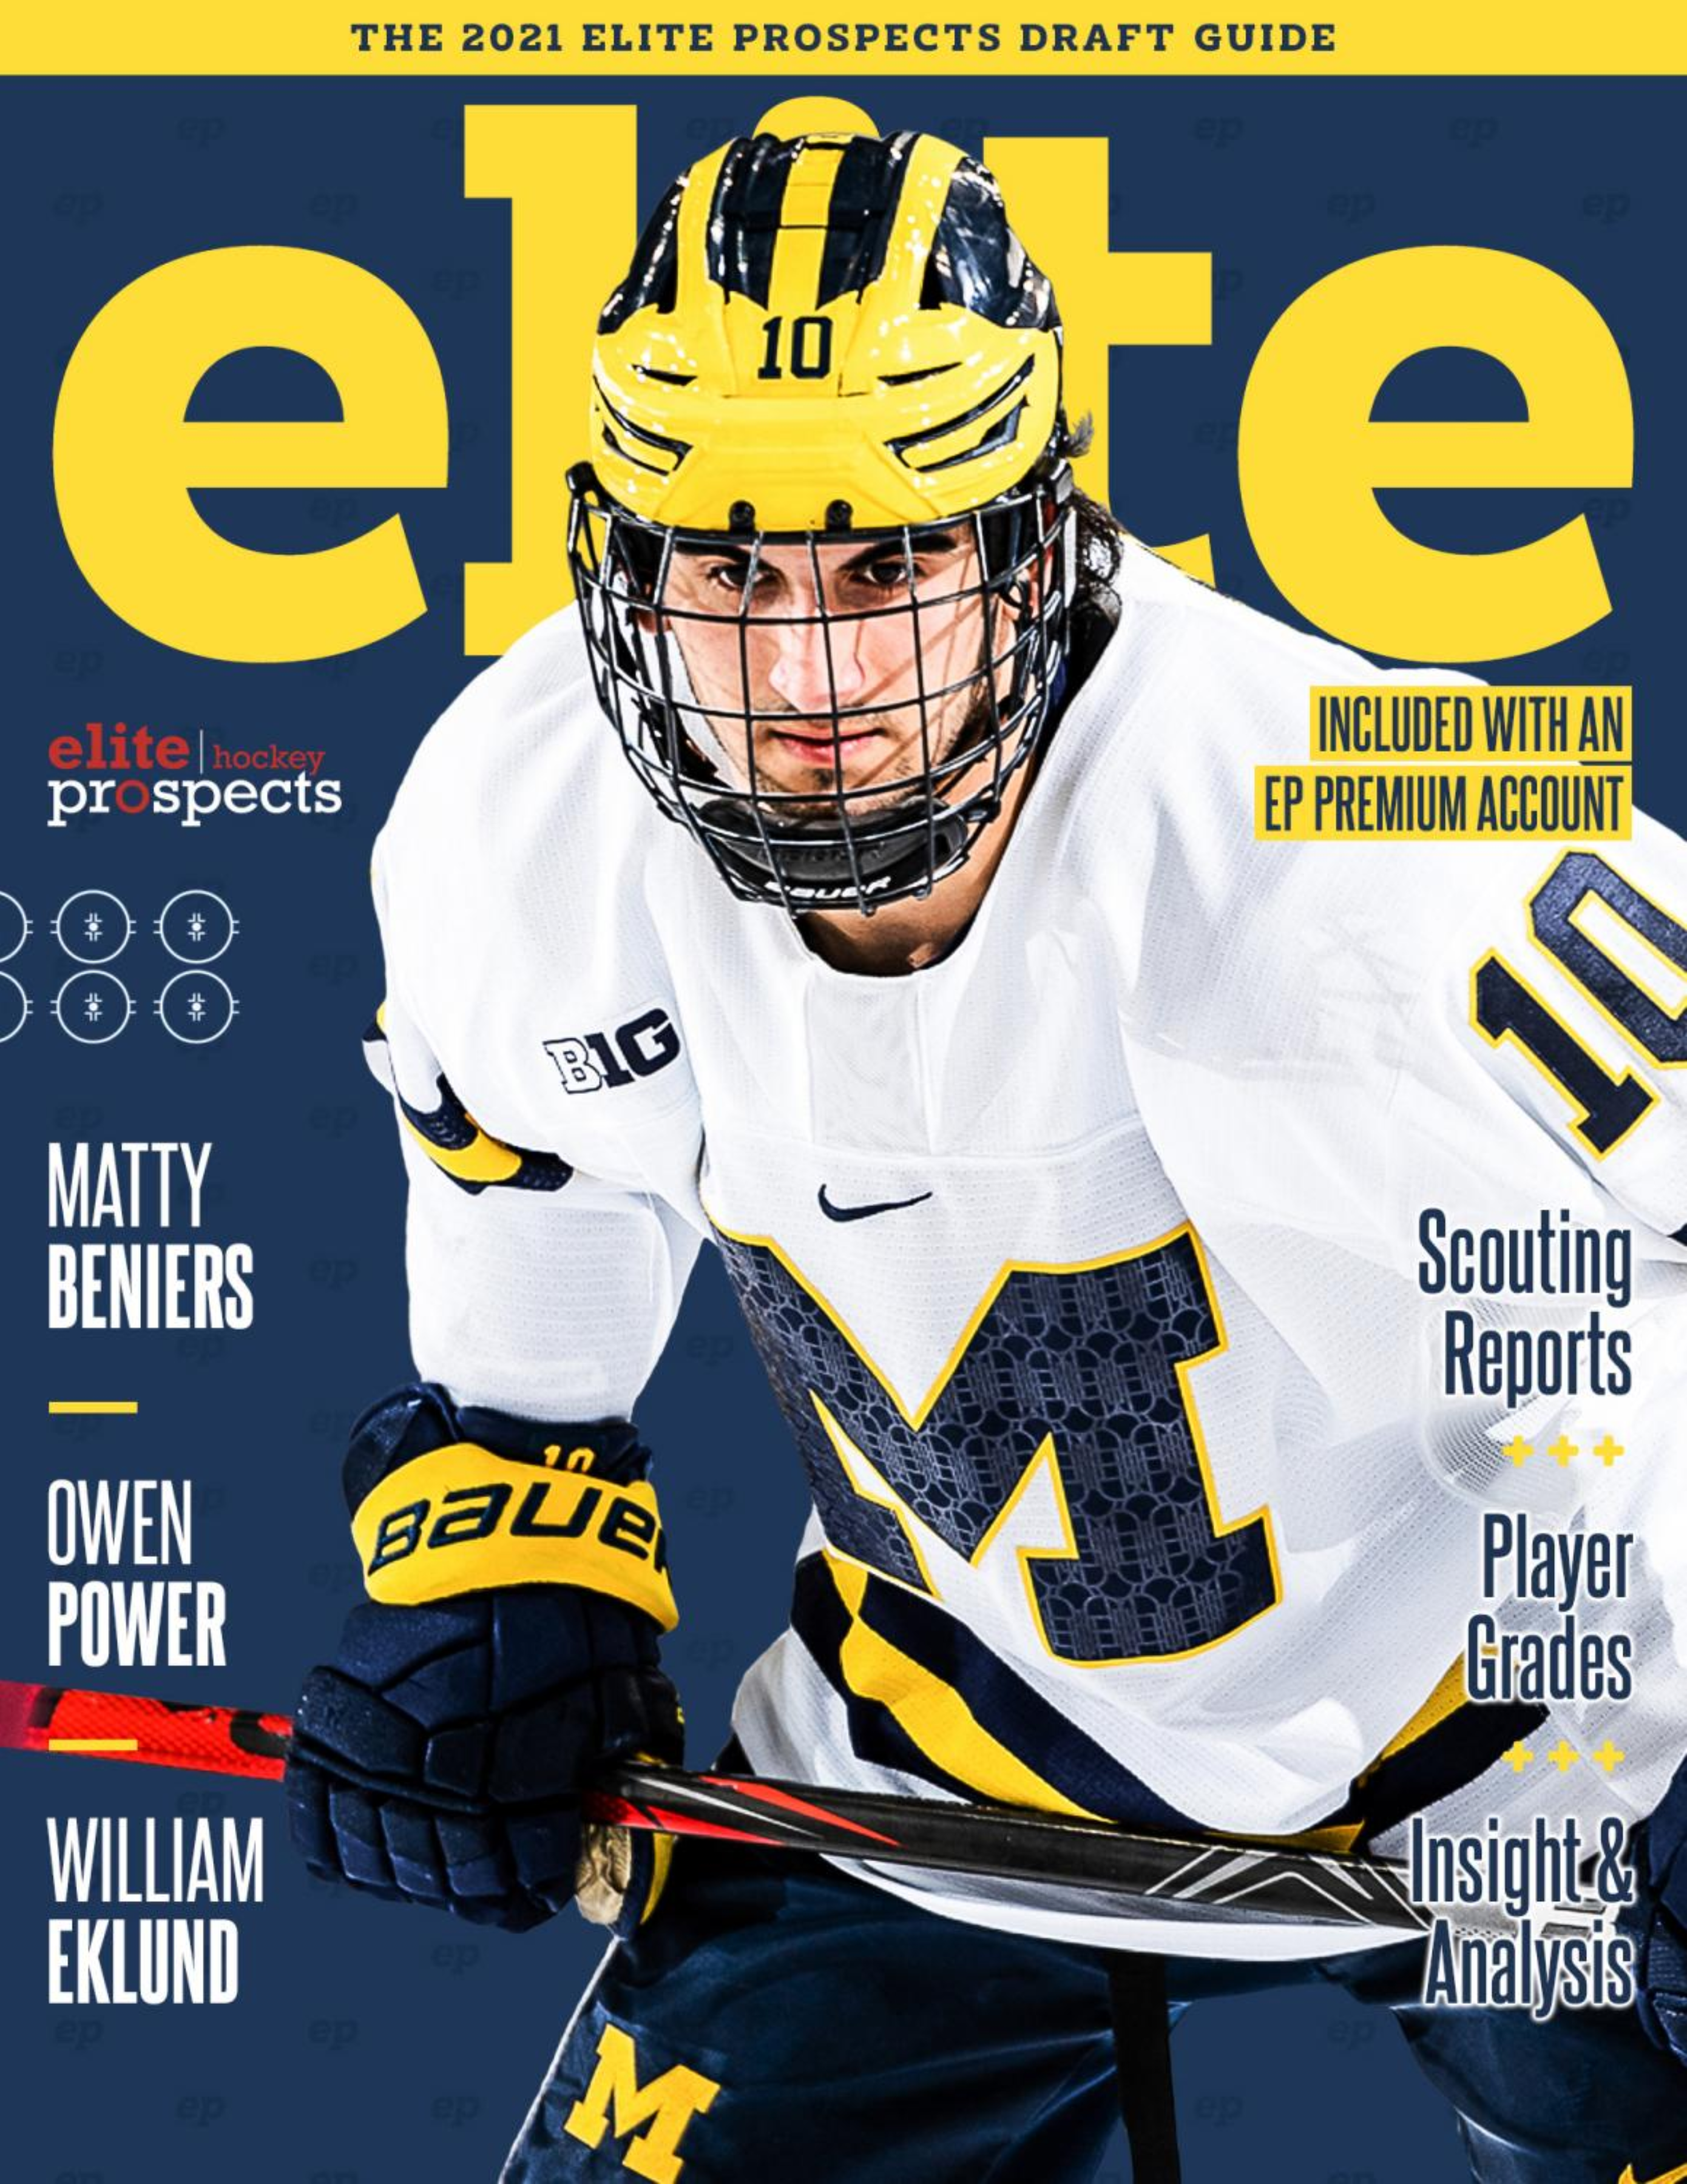 2021 Elite Prospects NHL Draft Guide